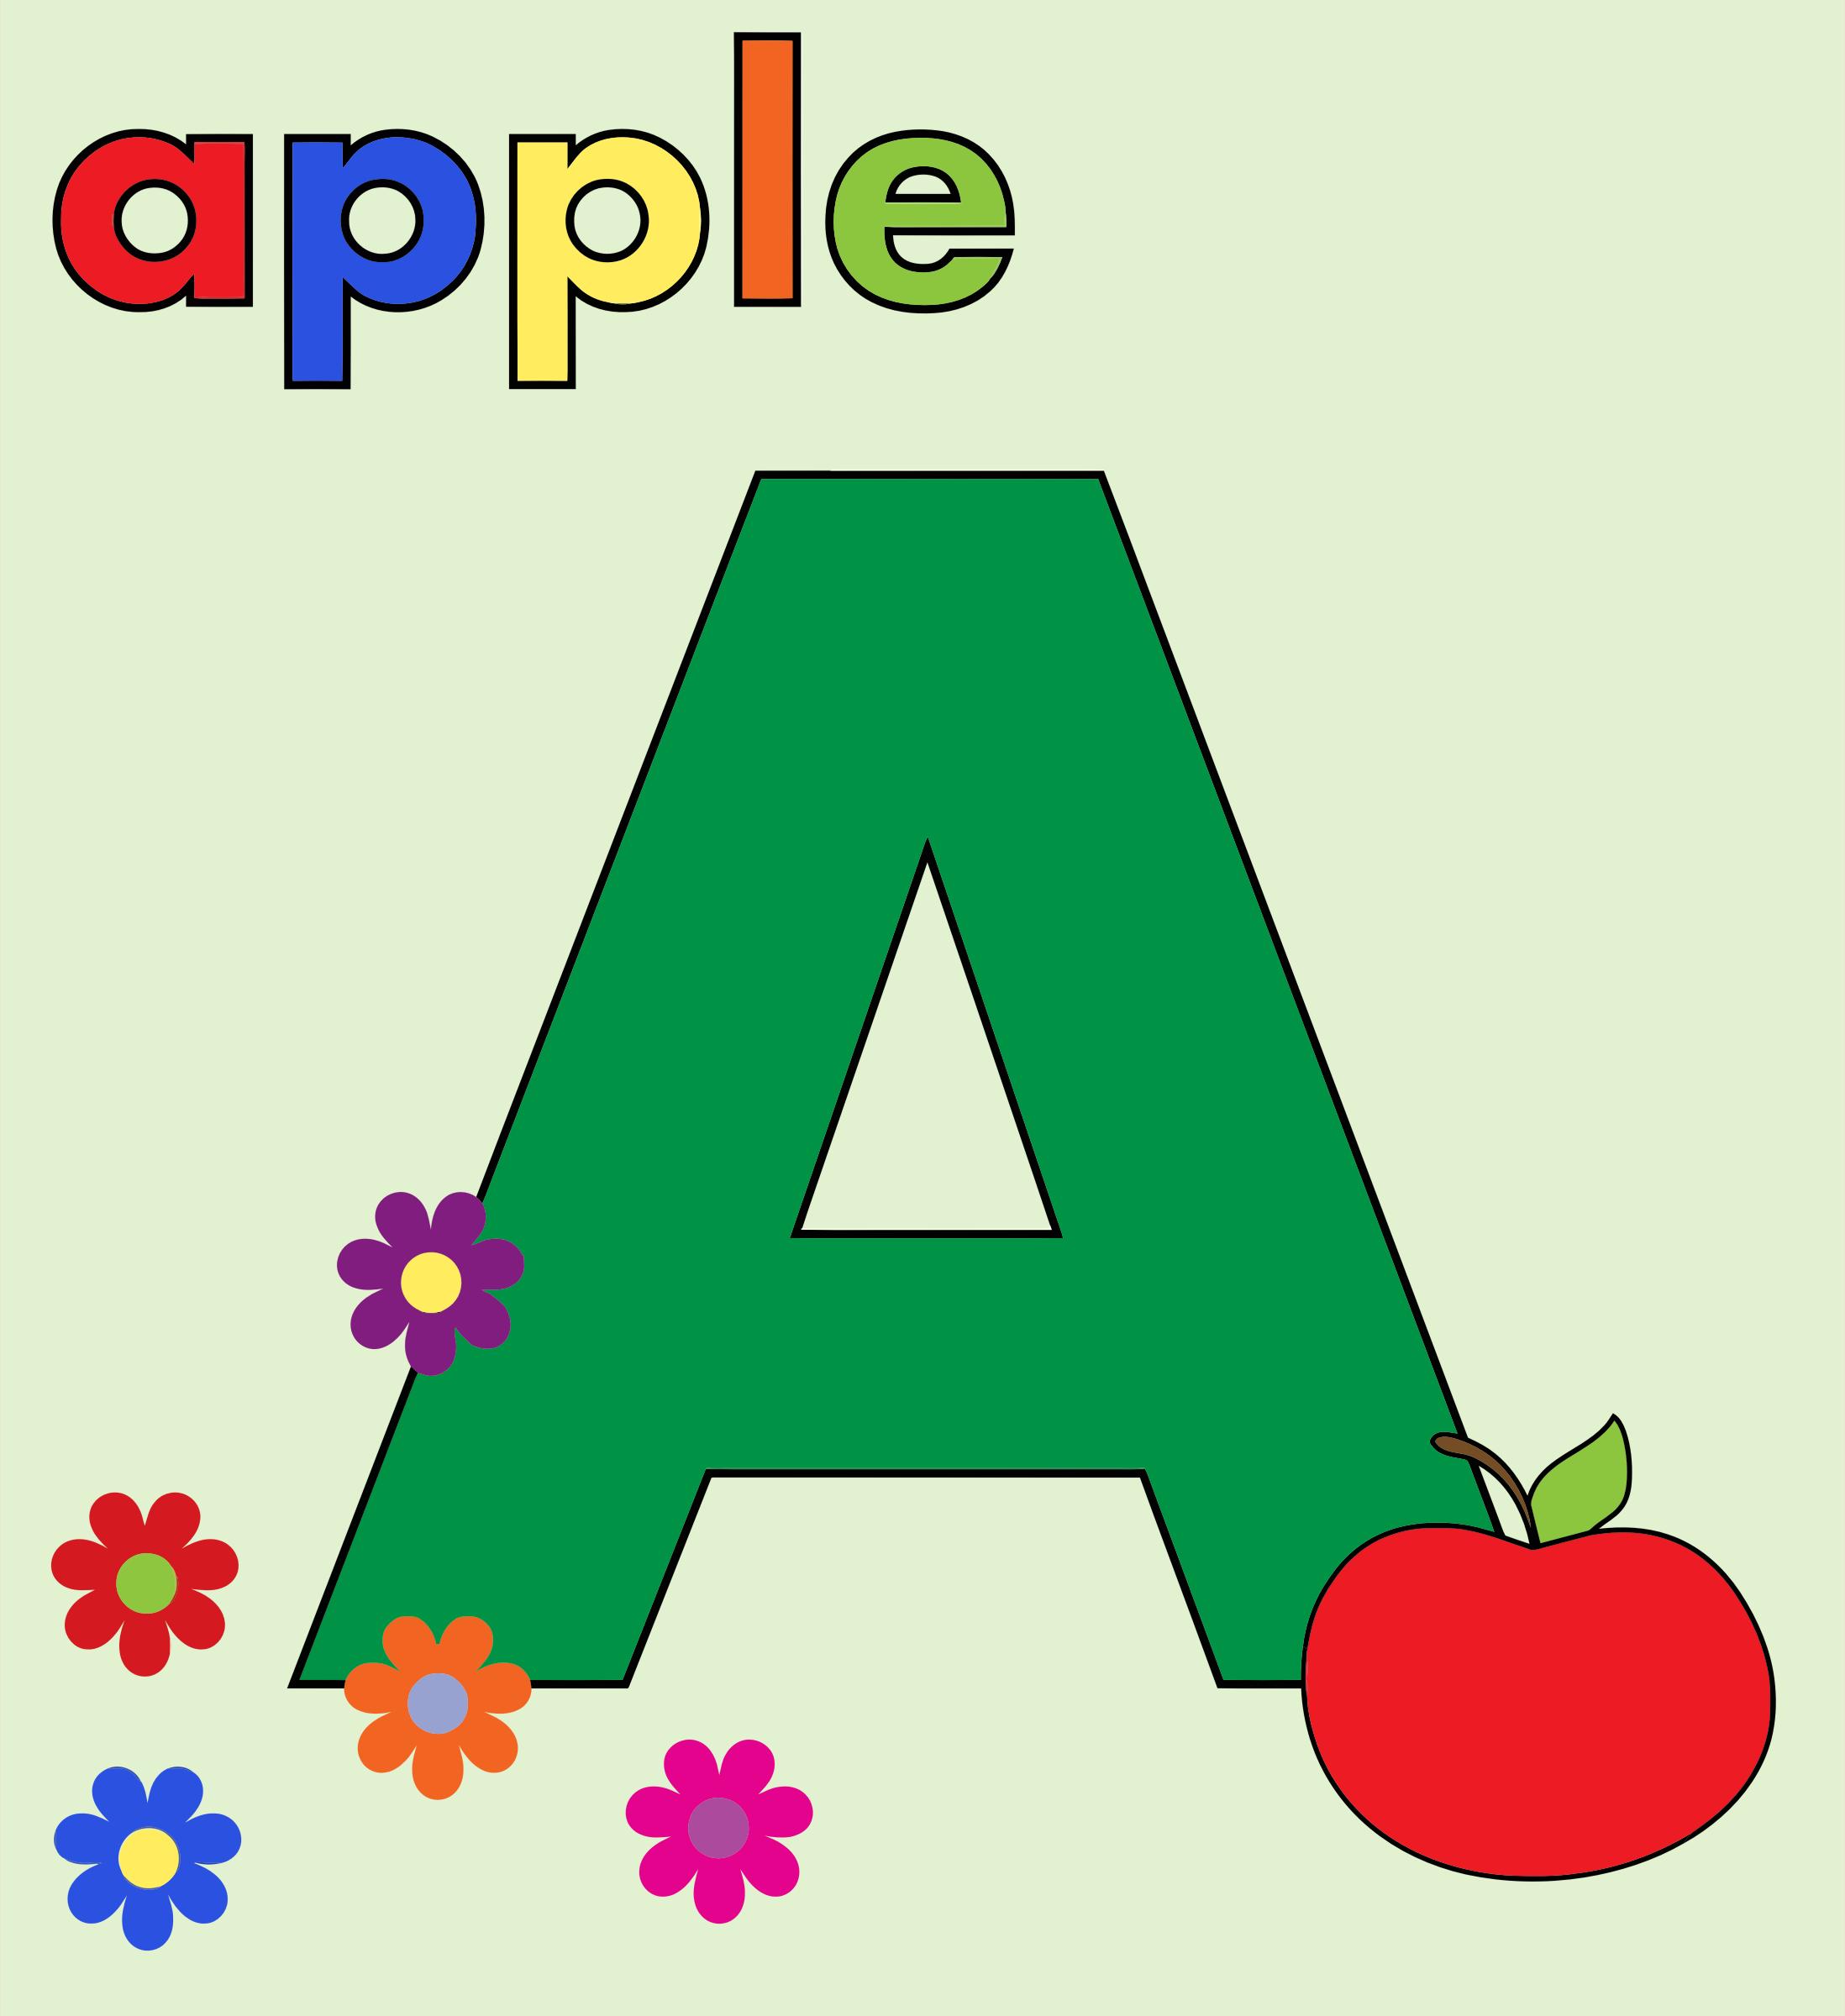 Apple clipart alphabet Alphabet Clipart A Apple A